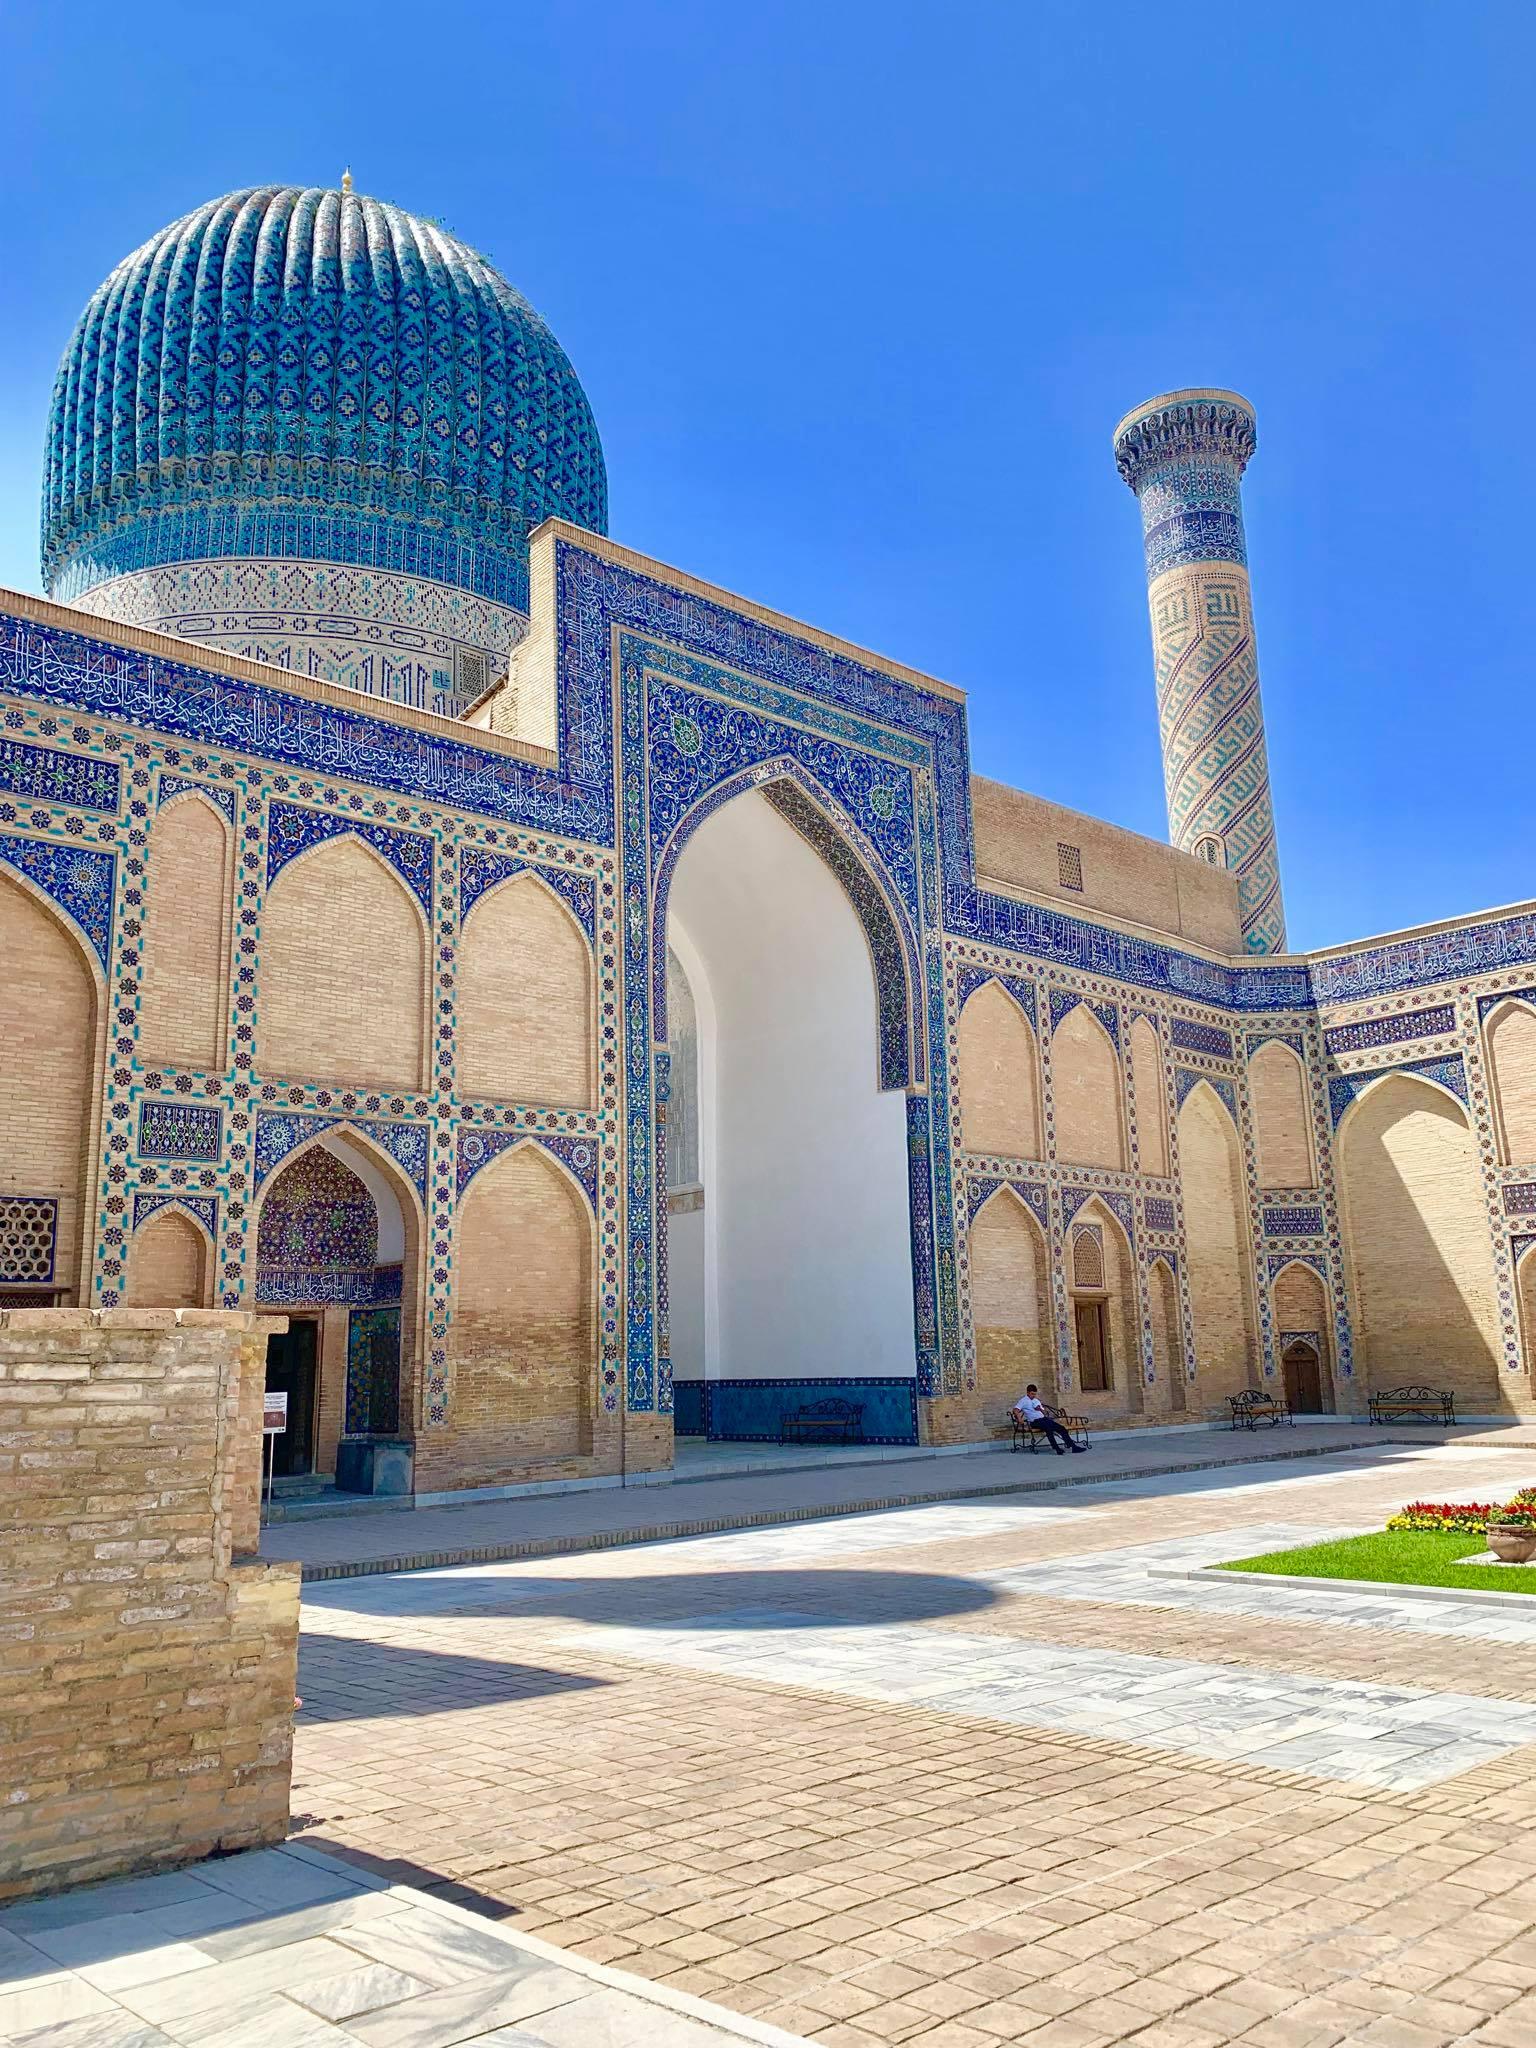 Kach Solo Travels in 2019 Siyab Bazaar and Registan on my first day in Samarkand7.jpg